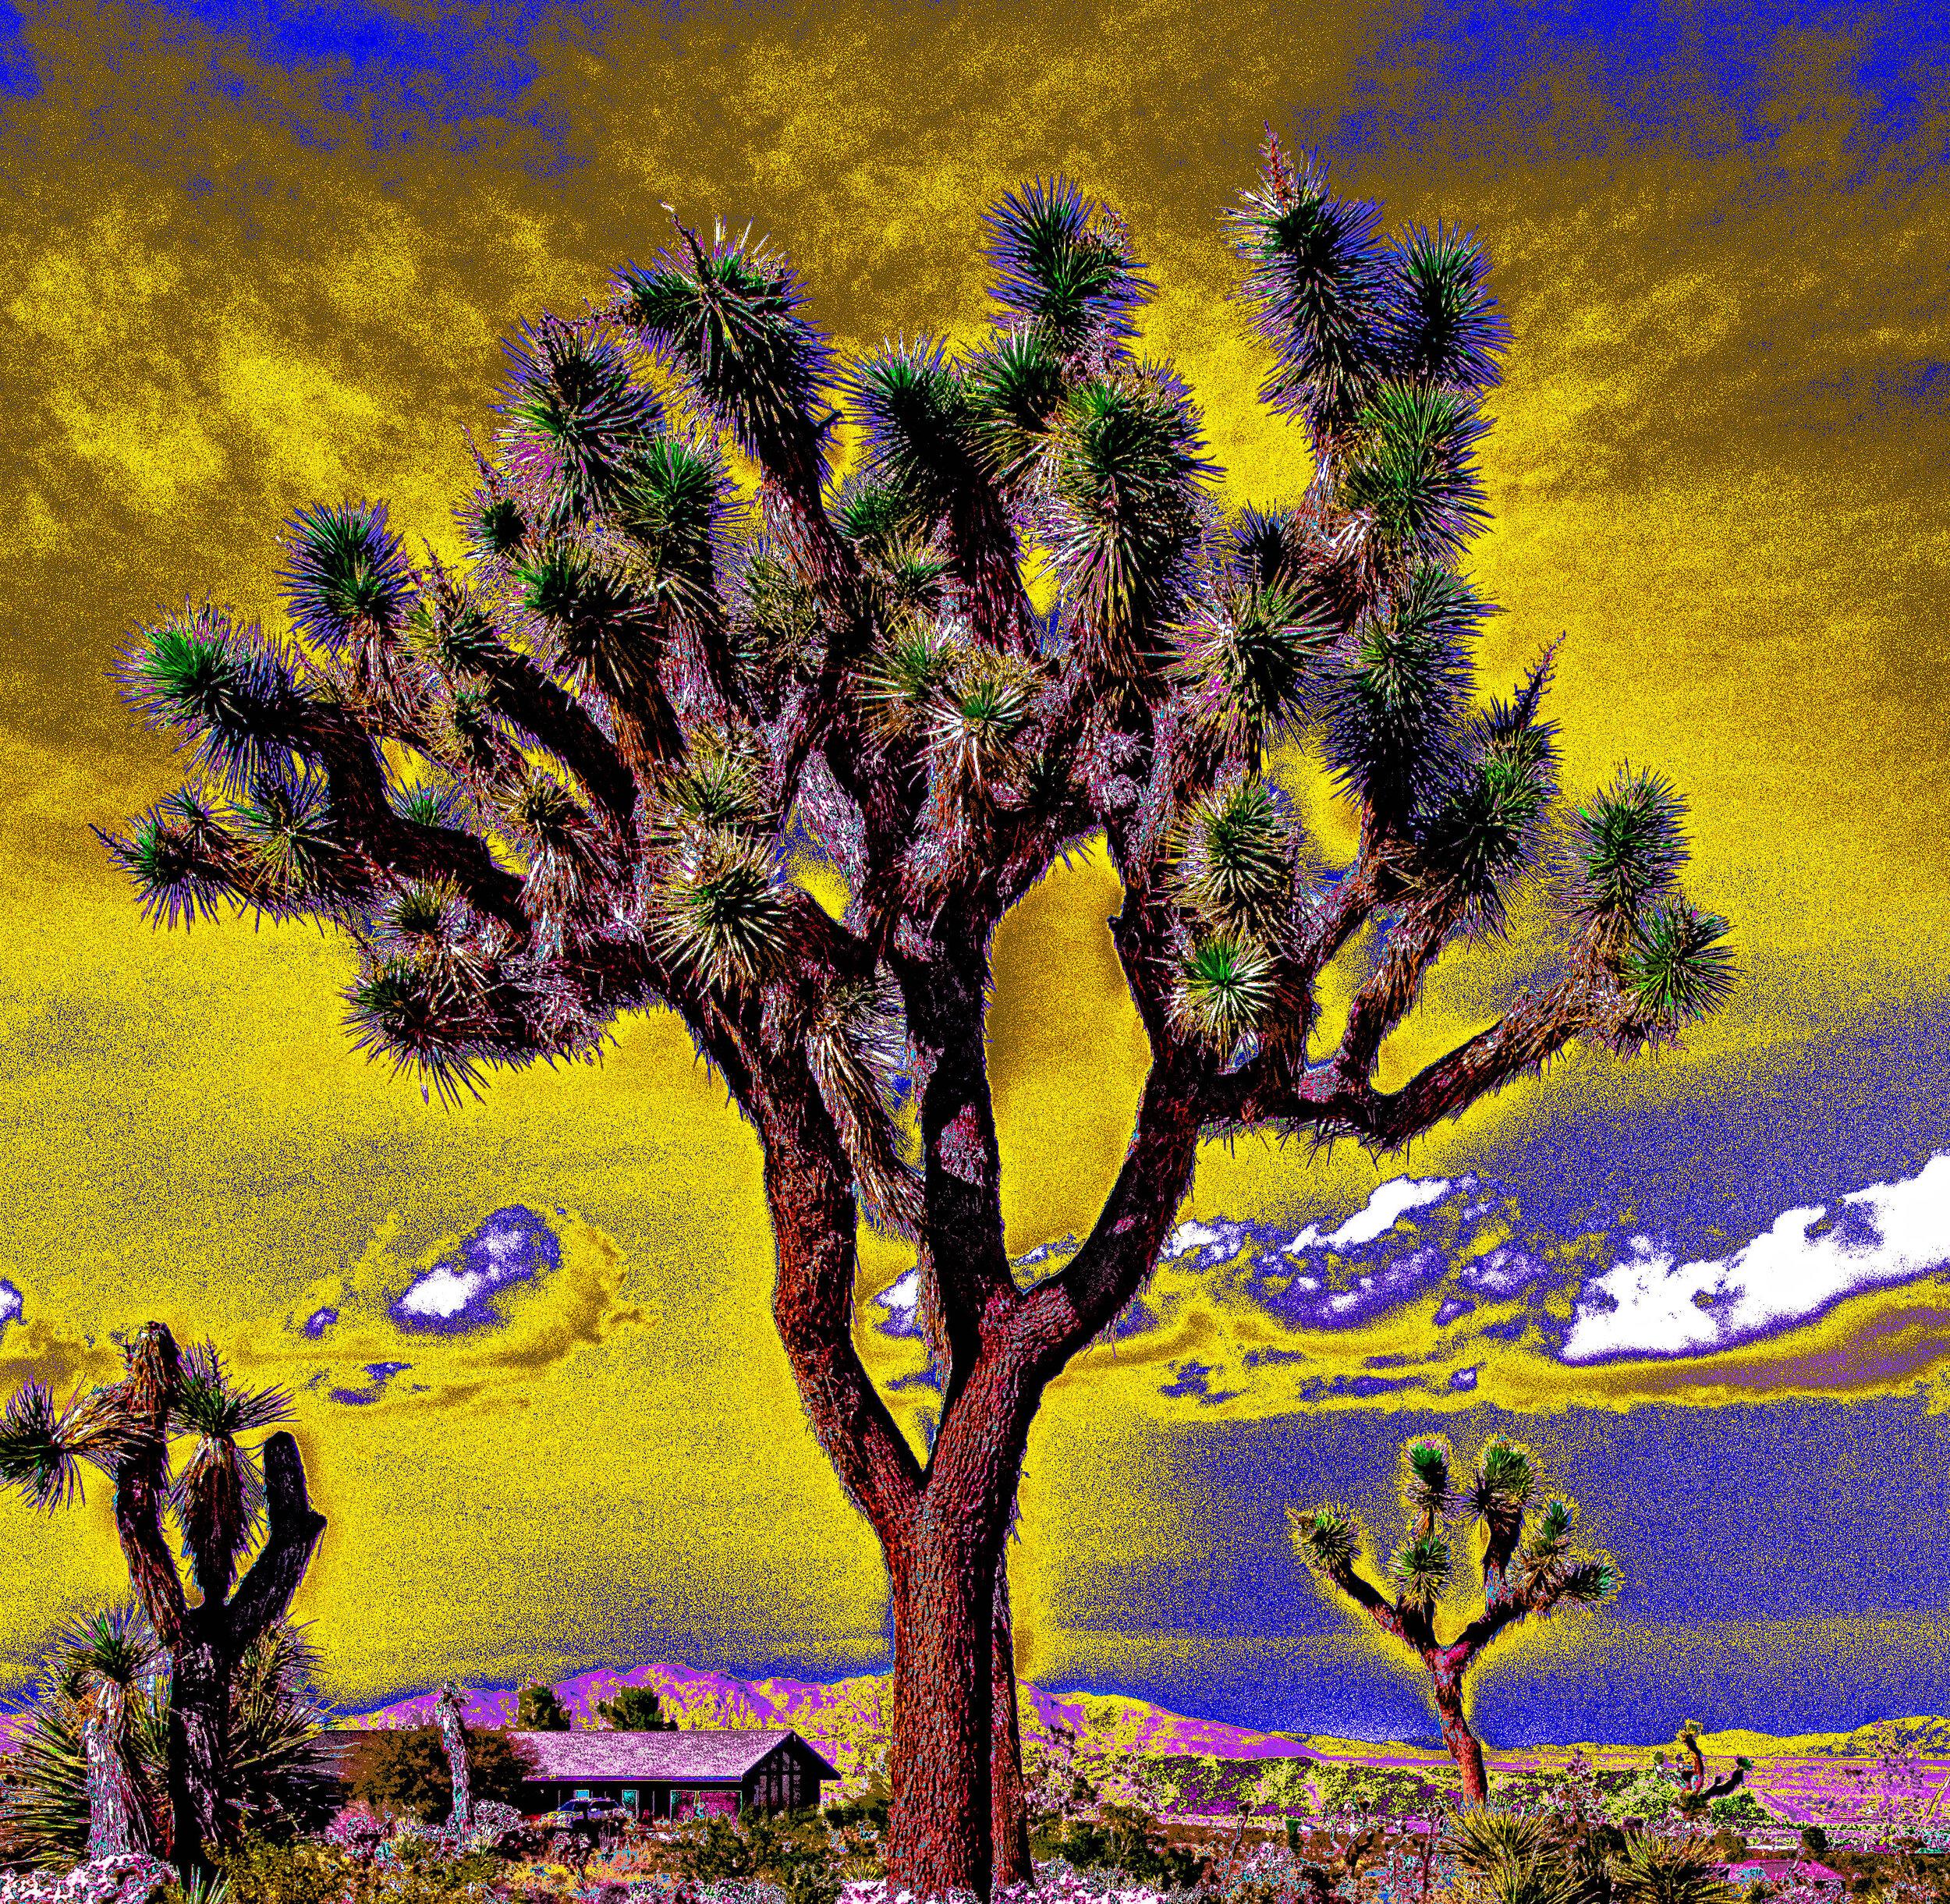 Joshua Tree Storm Clouds 2 YellowSky